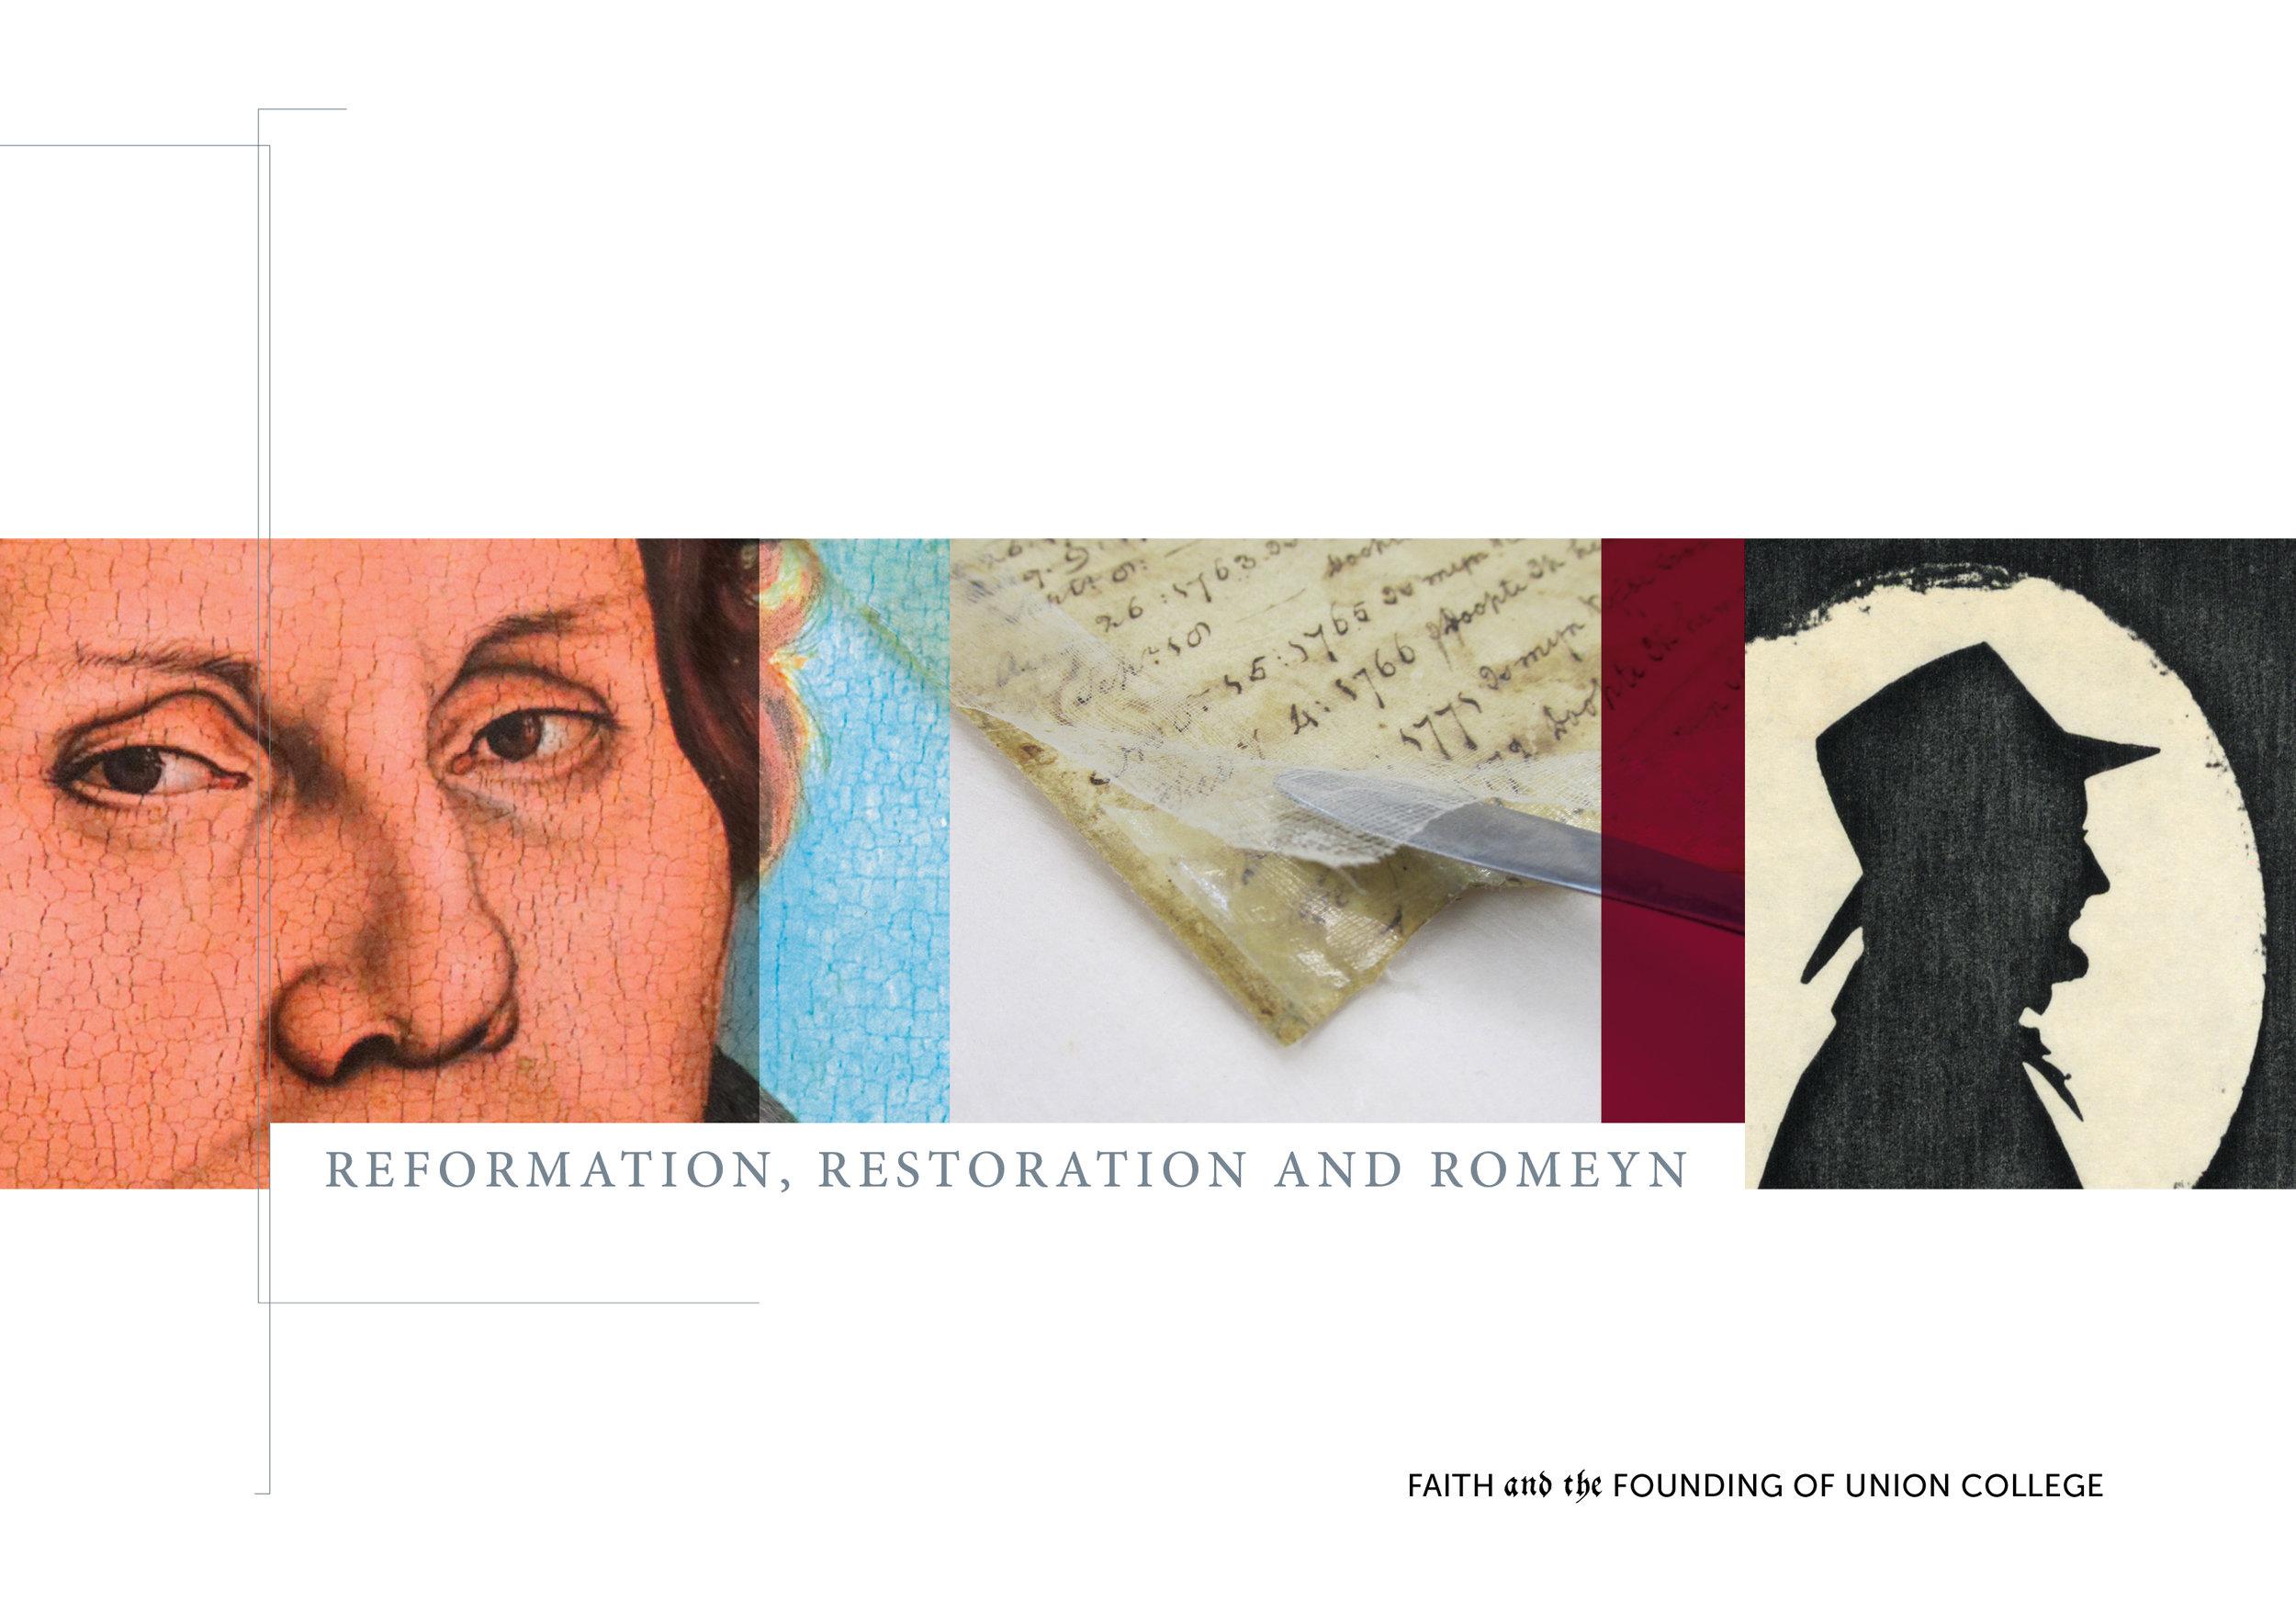 ReformationRestorationandRomeynExhibitBro.110117.jpg